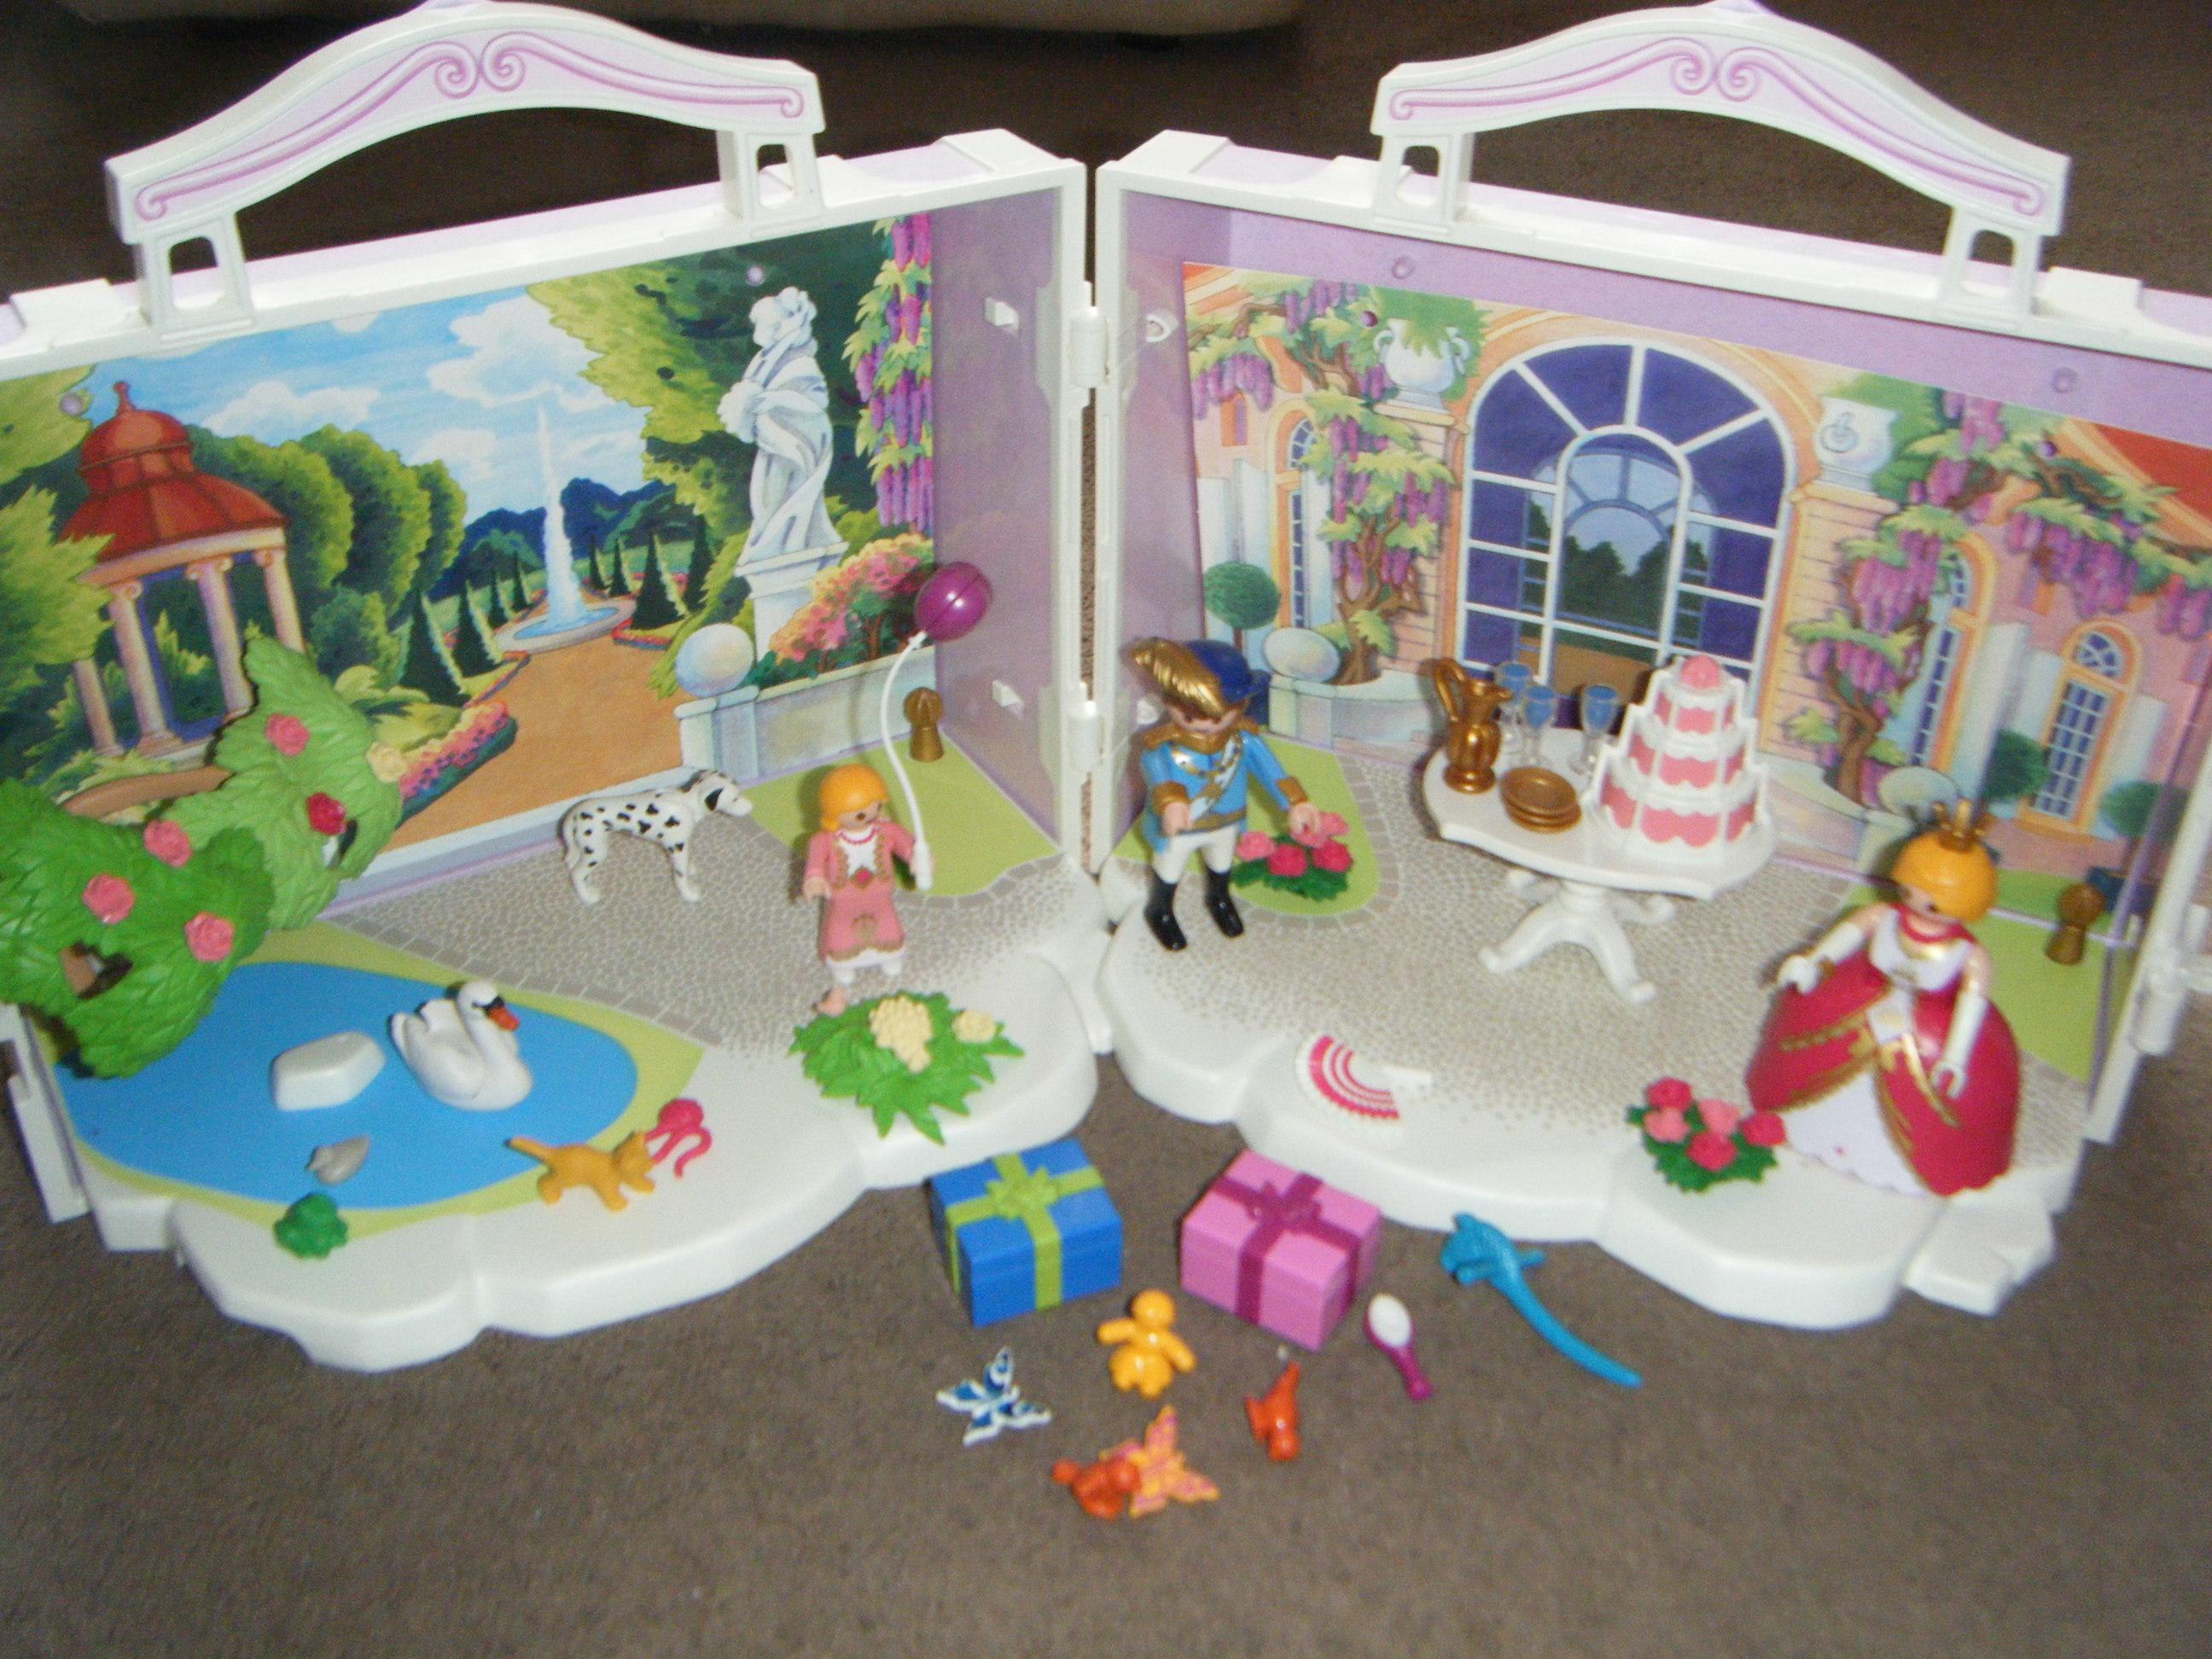 Playmobil Take Along Princess Birthday Set Review